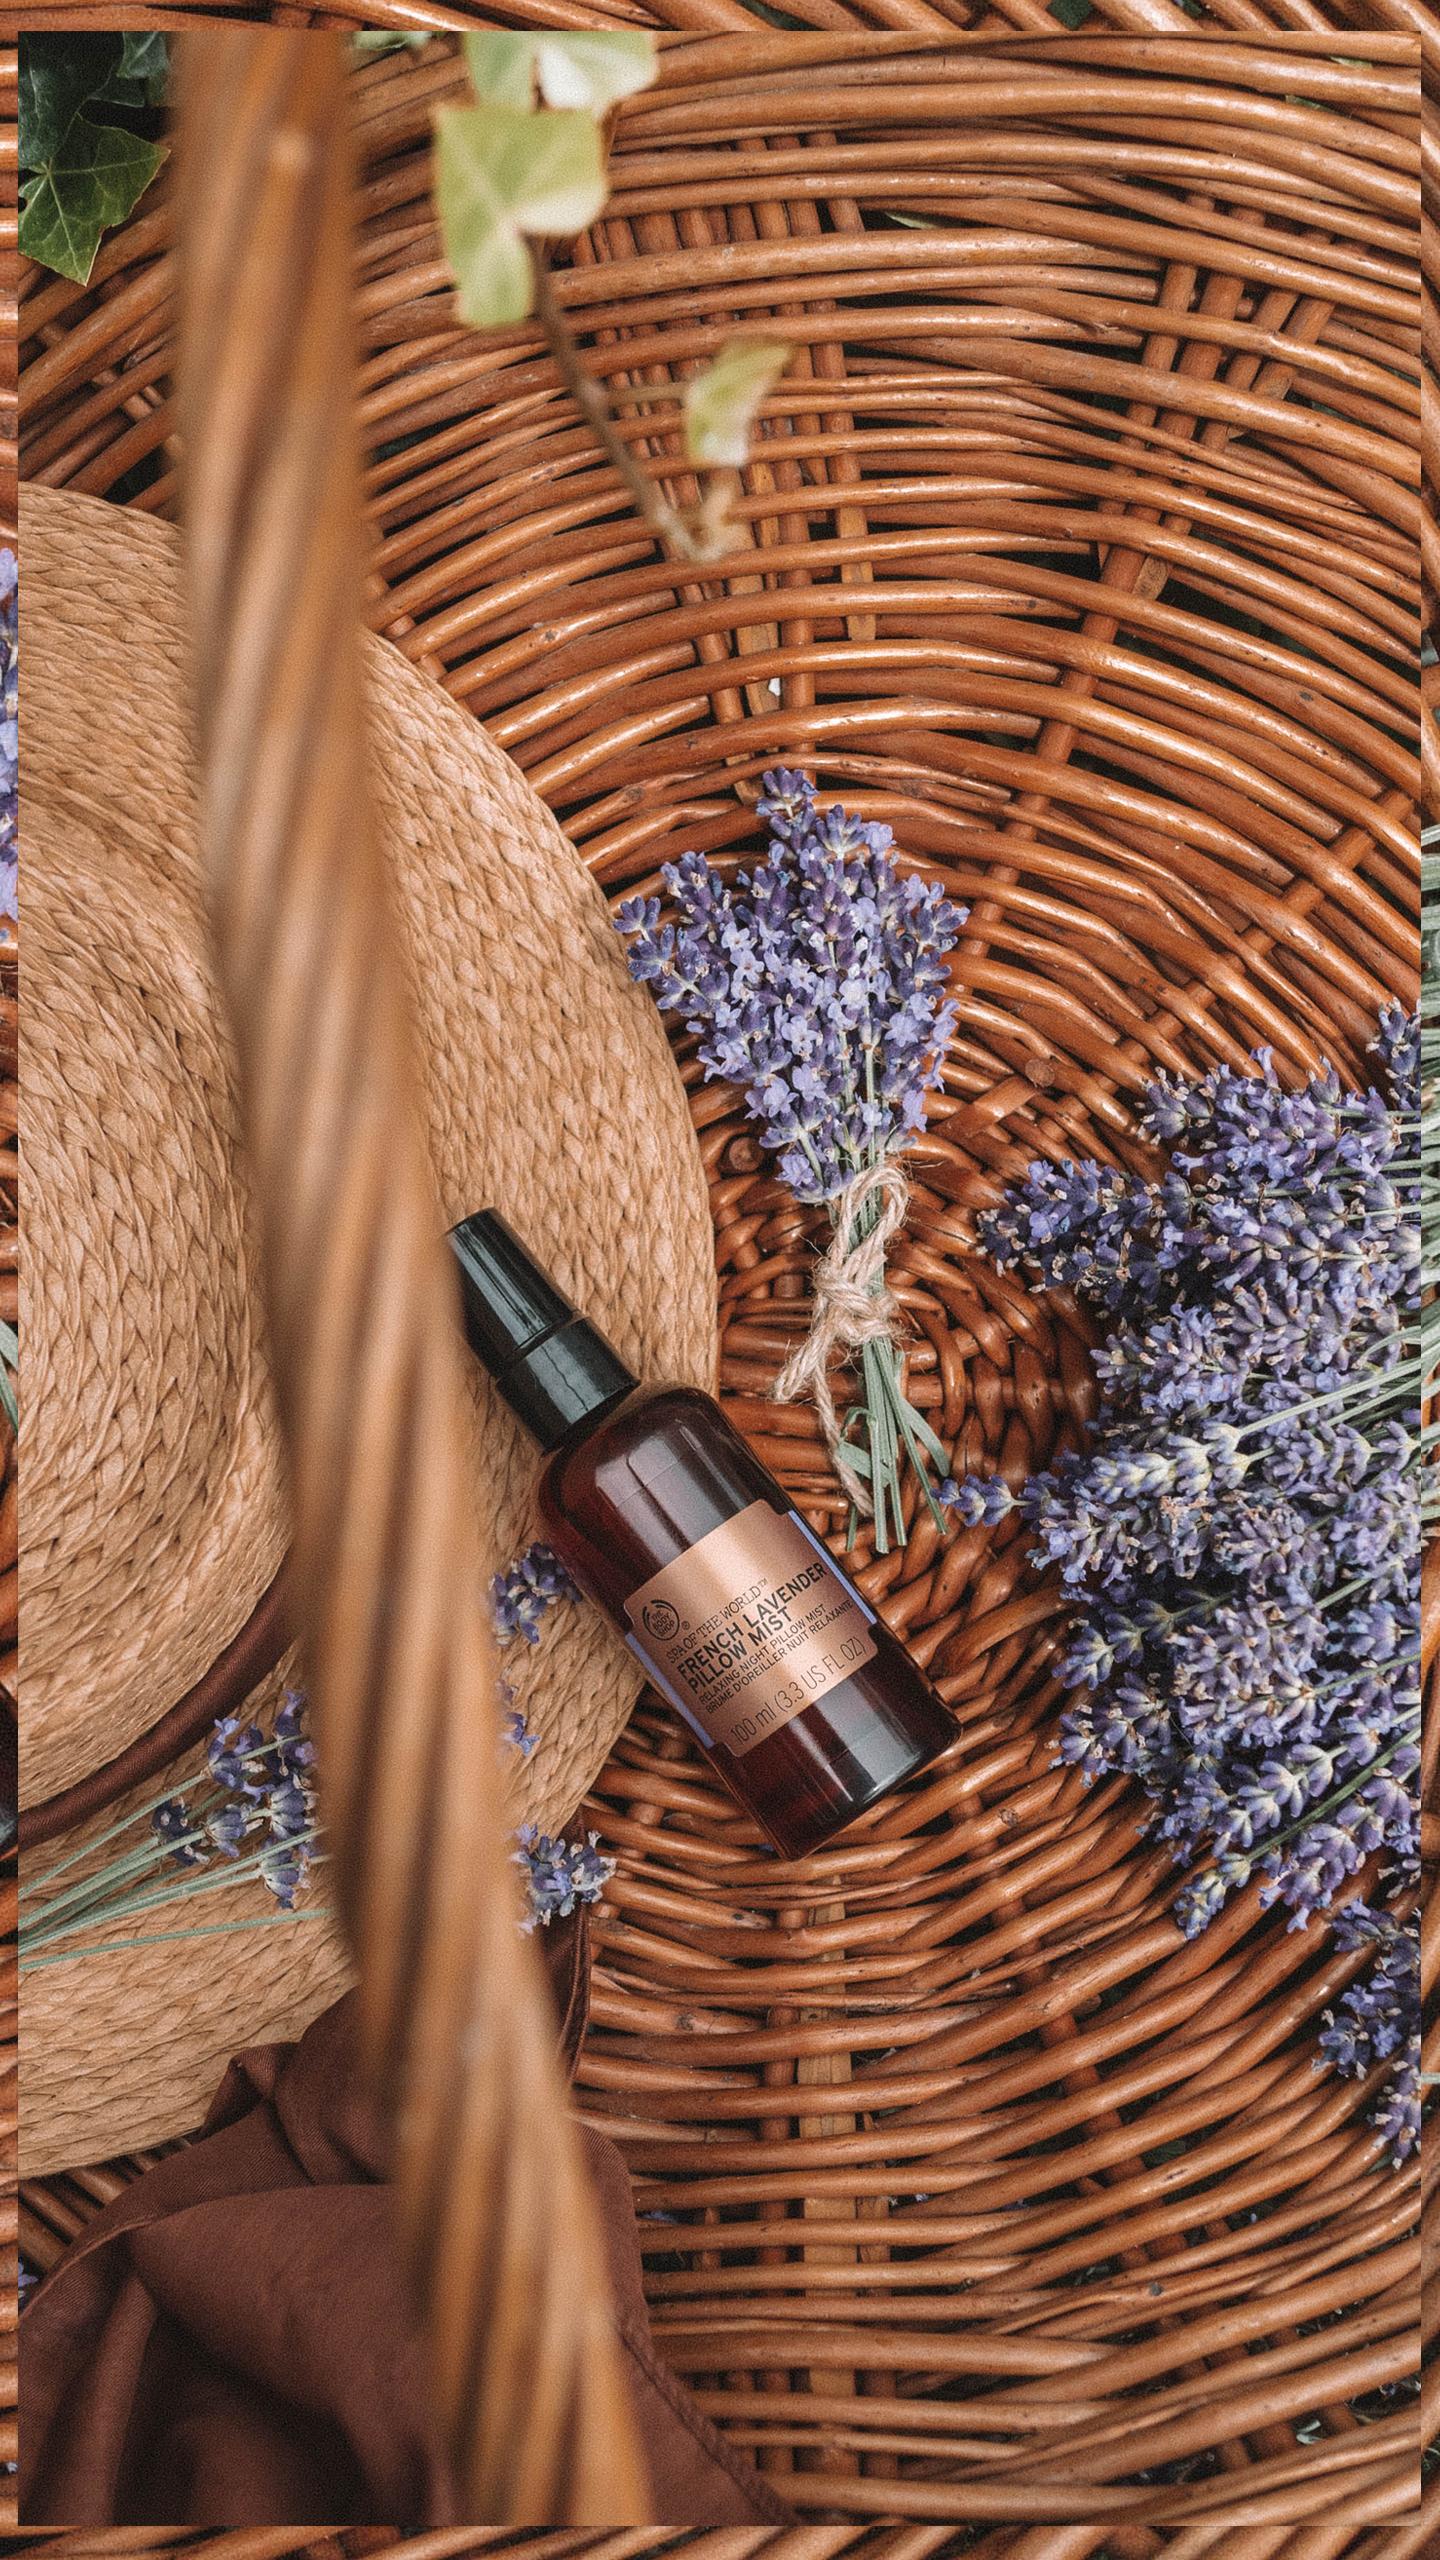 Secrets Spa of the World Lavender Pillow Mist The Body Shop